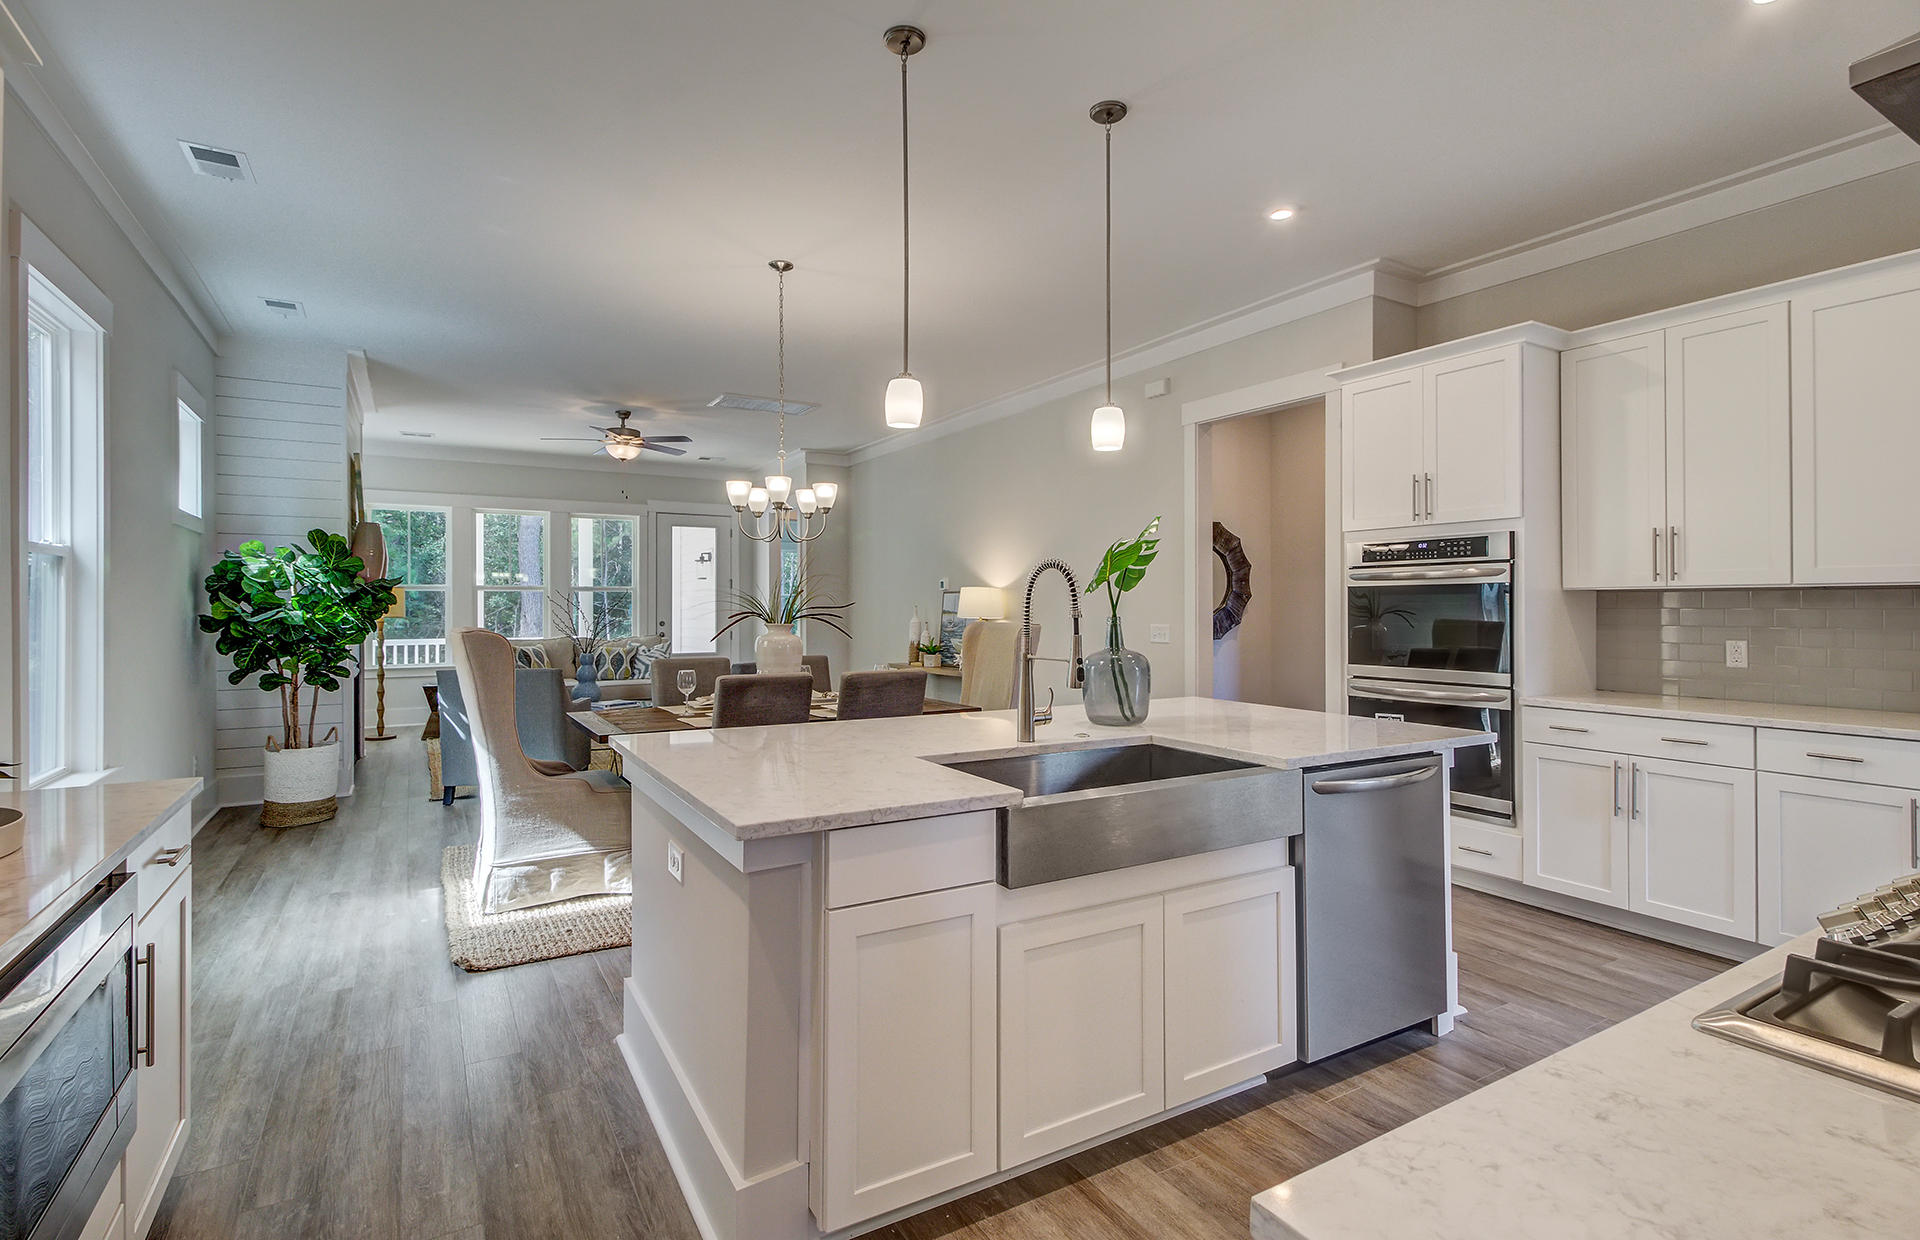 Fulton Park Homes For Sale - 1282 Max, Mount Pleasant, SC - 24